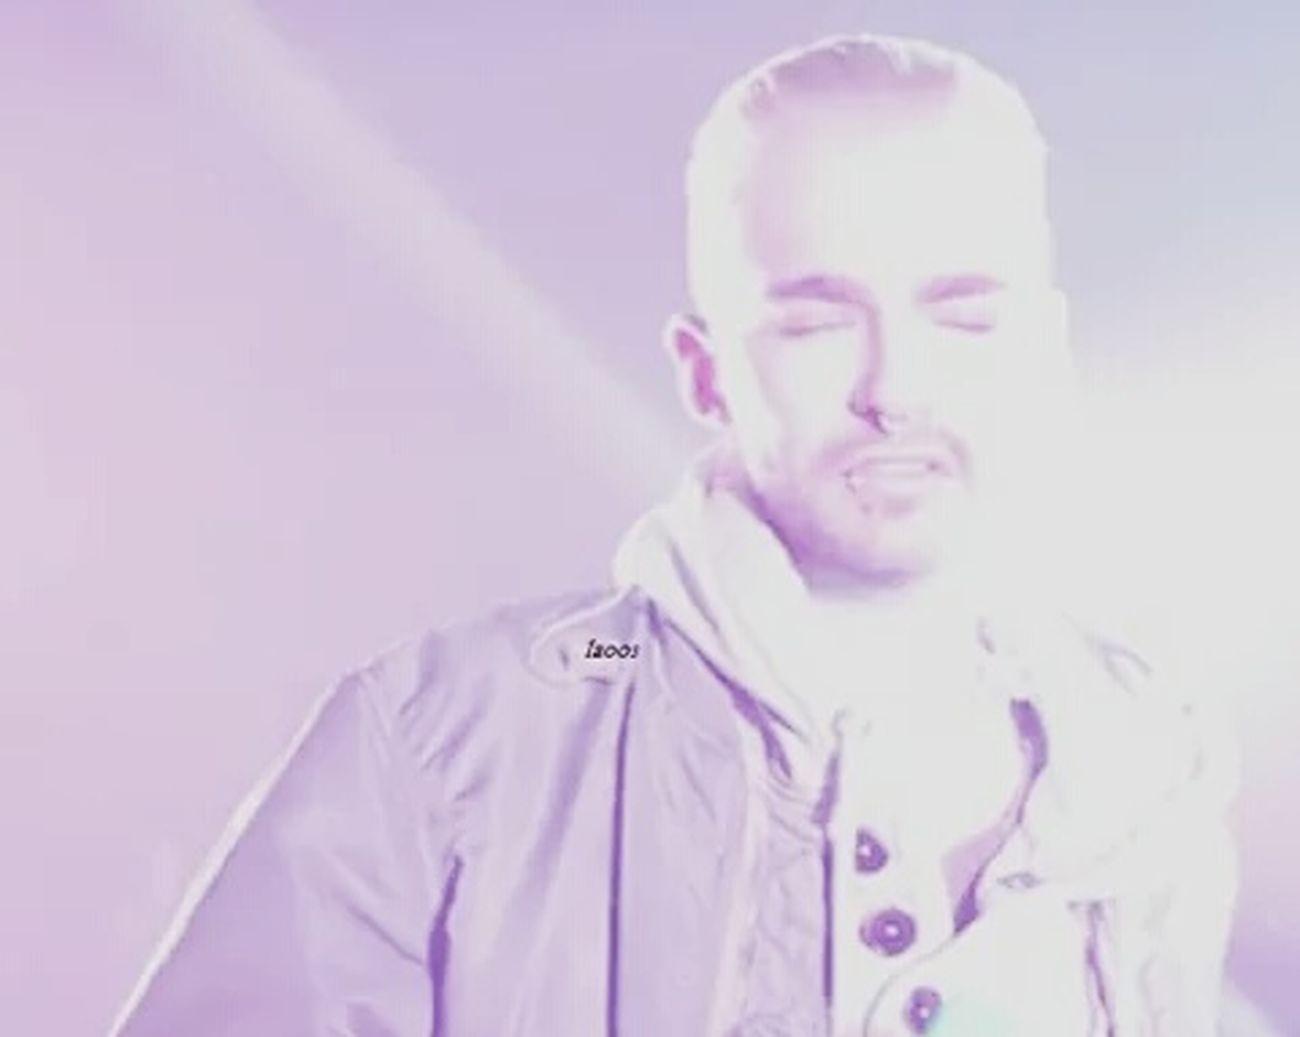 Open eyes blinded by the city lights... Bill Kaulitz Tokio Hotel Fia World Tour